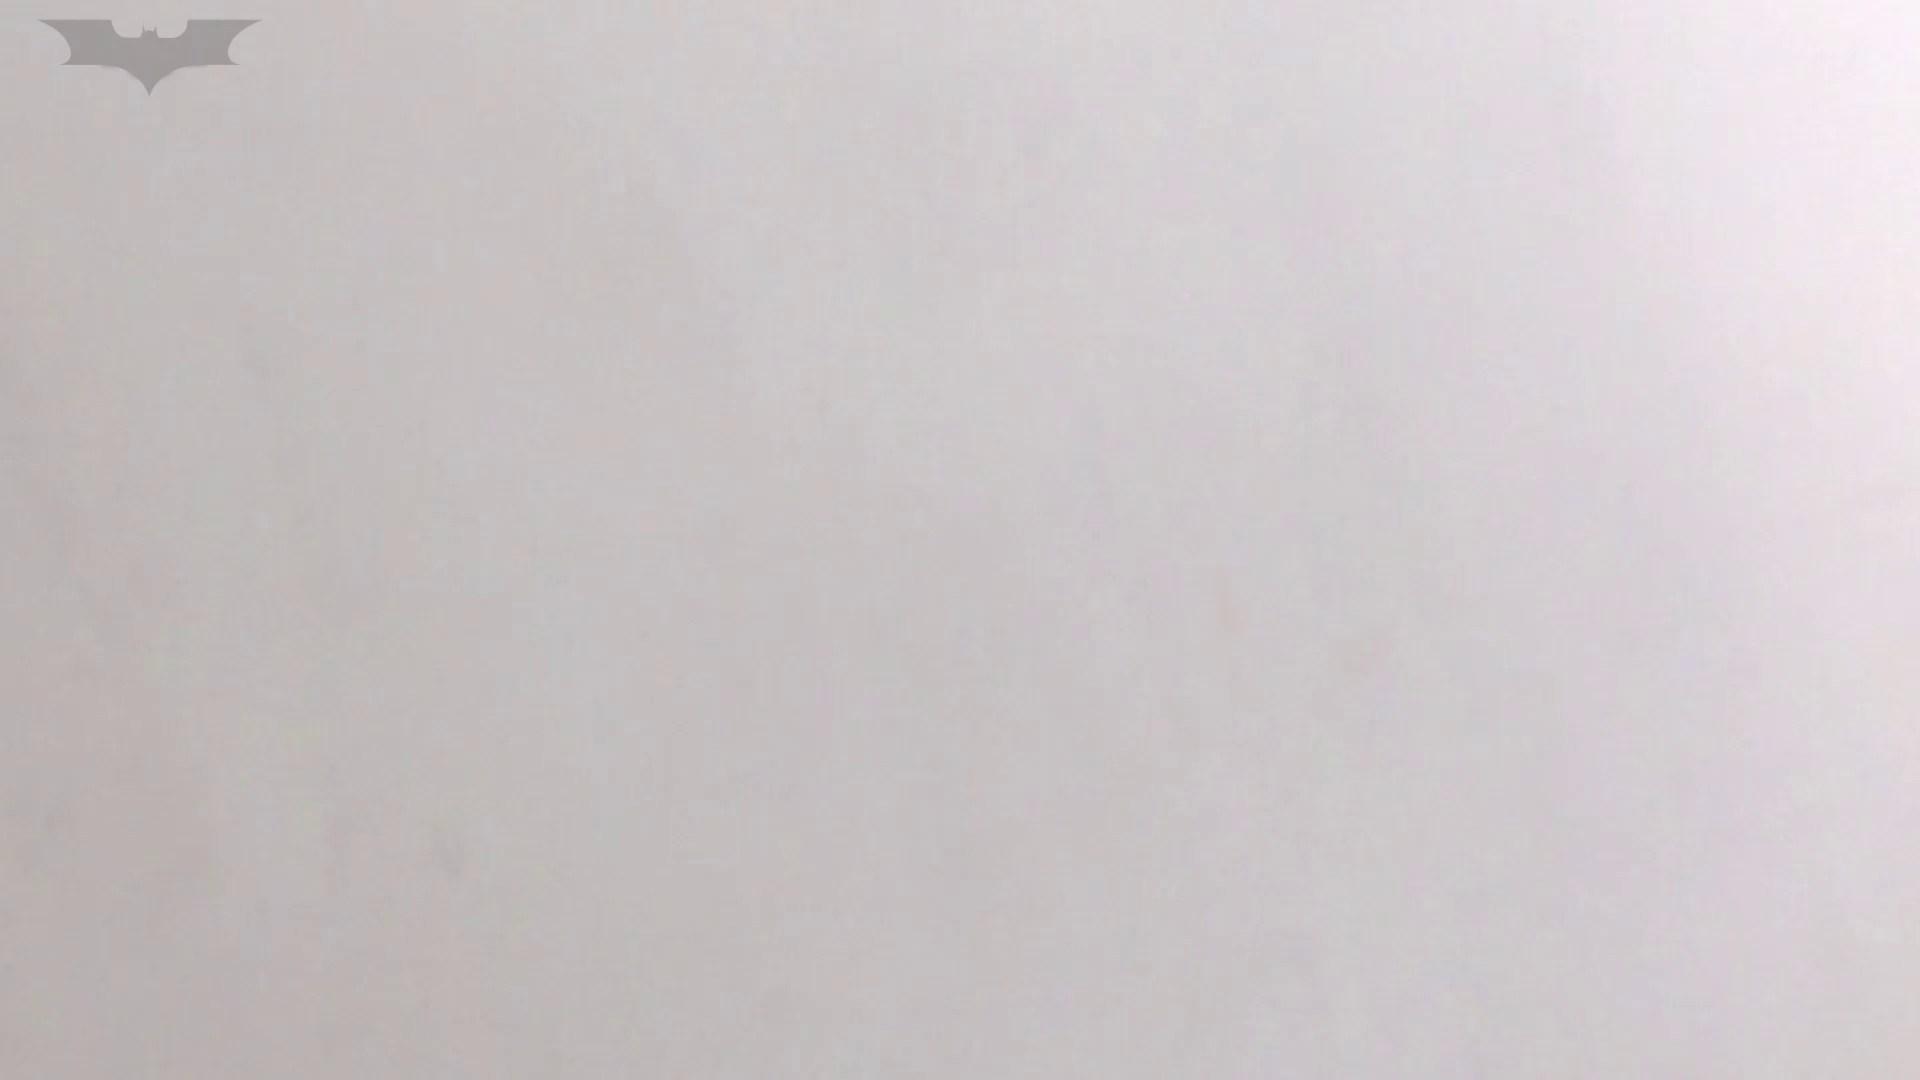 JD盗撮 美女の洗面所の秘密 Vol.10 特撮トイレ | 0  101画像 43